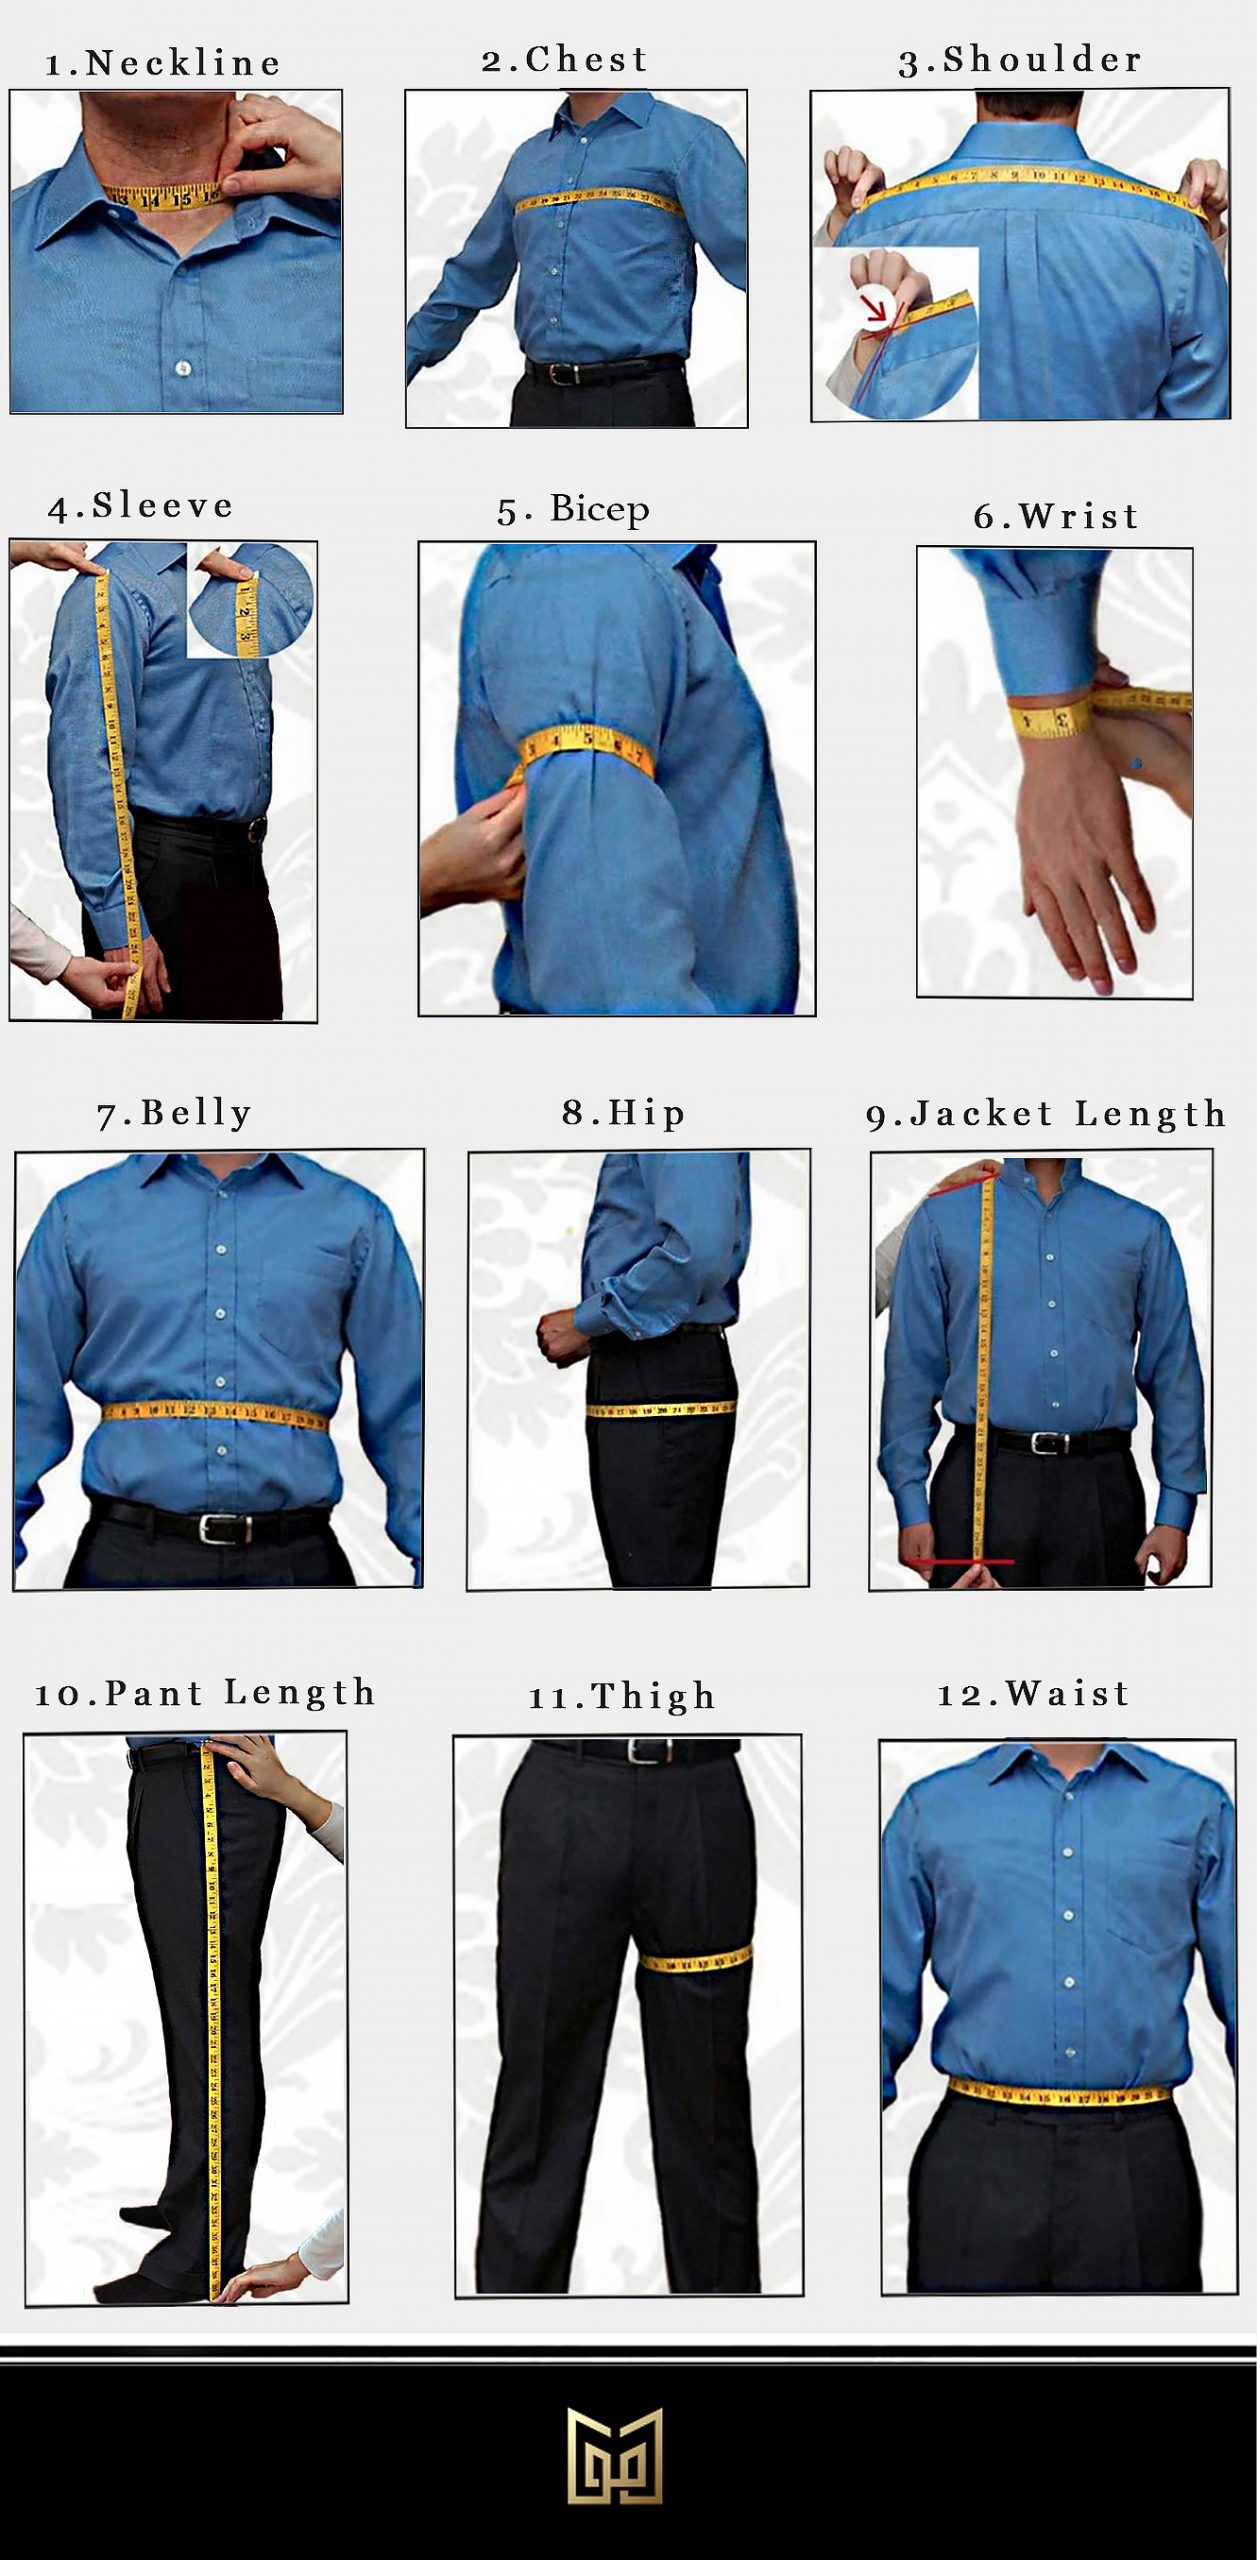 Custom-Size-Guide-from-Gentlemansguru.com